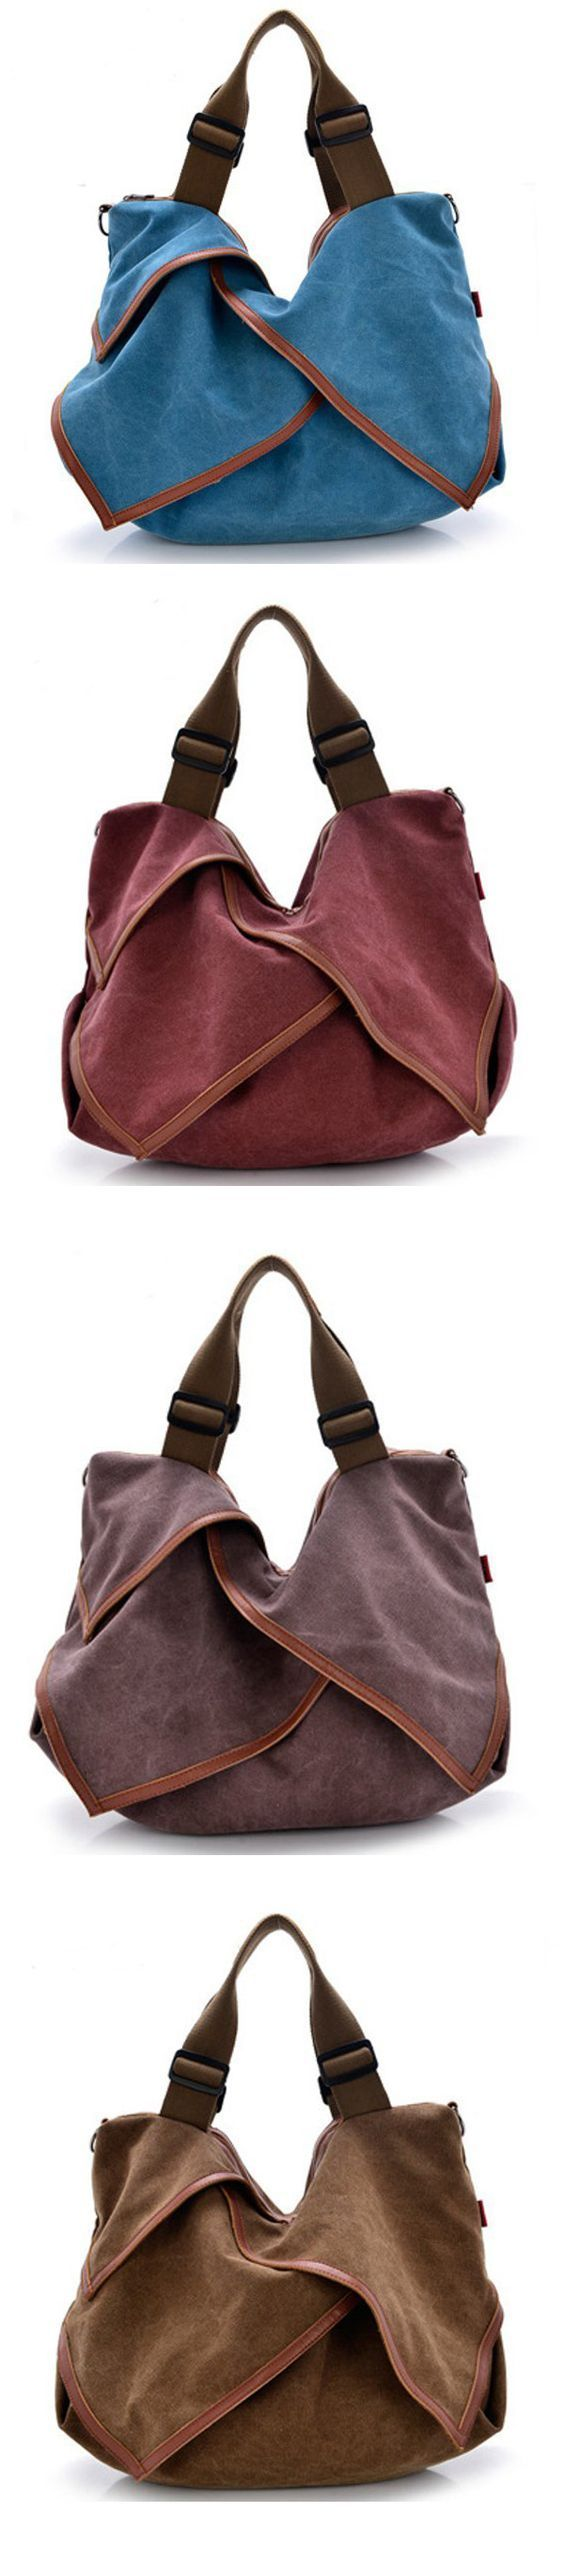 【48% OFF】Canvas Portable Flower Design Big Handbags_Designer  Crossbody Bags_Casual Shoulder Bag For Woman